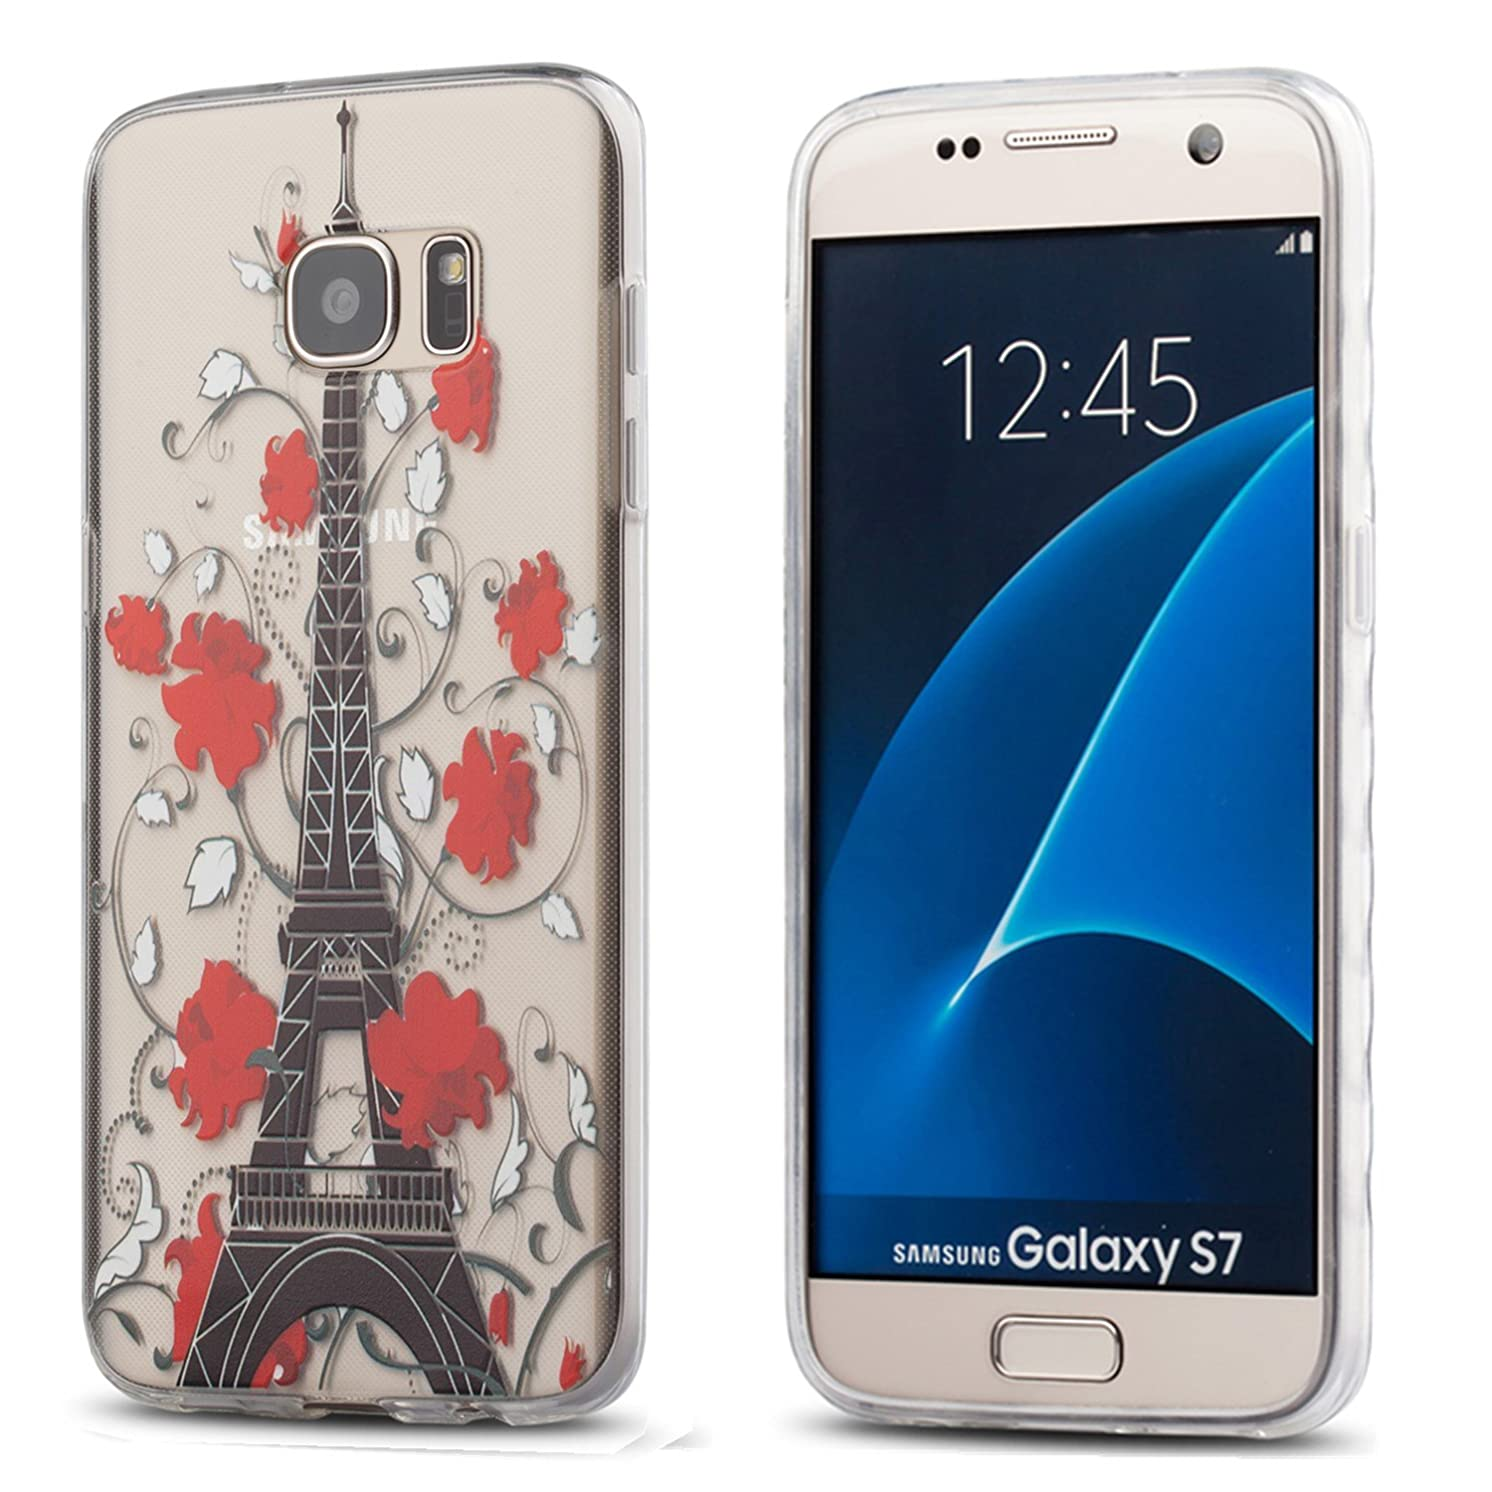 Galaxy S7 Case,3Cworld Ultra Thin Clear Art Pattern Crystal Gel TPU Rubber Flexible Slim Skin Soft Case for Samsung Galaxy S7 (Eiffel Tower /Flower- red)